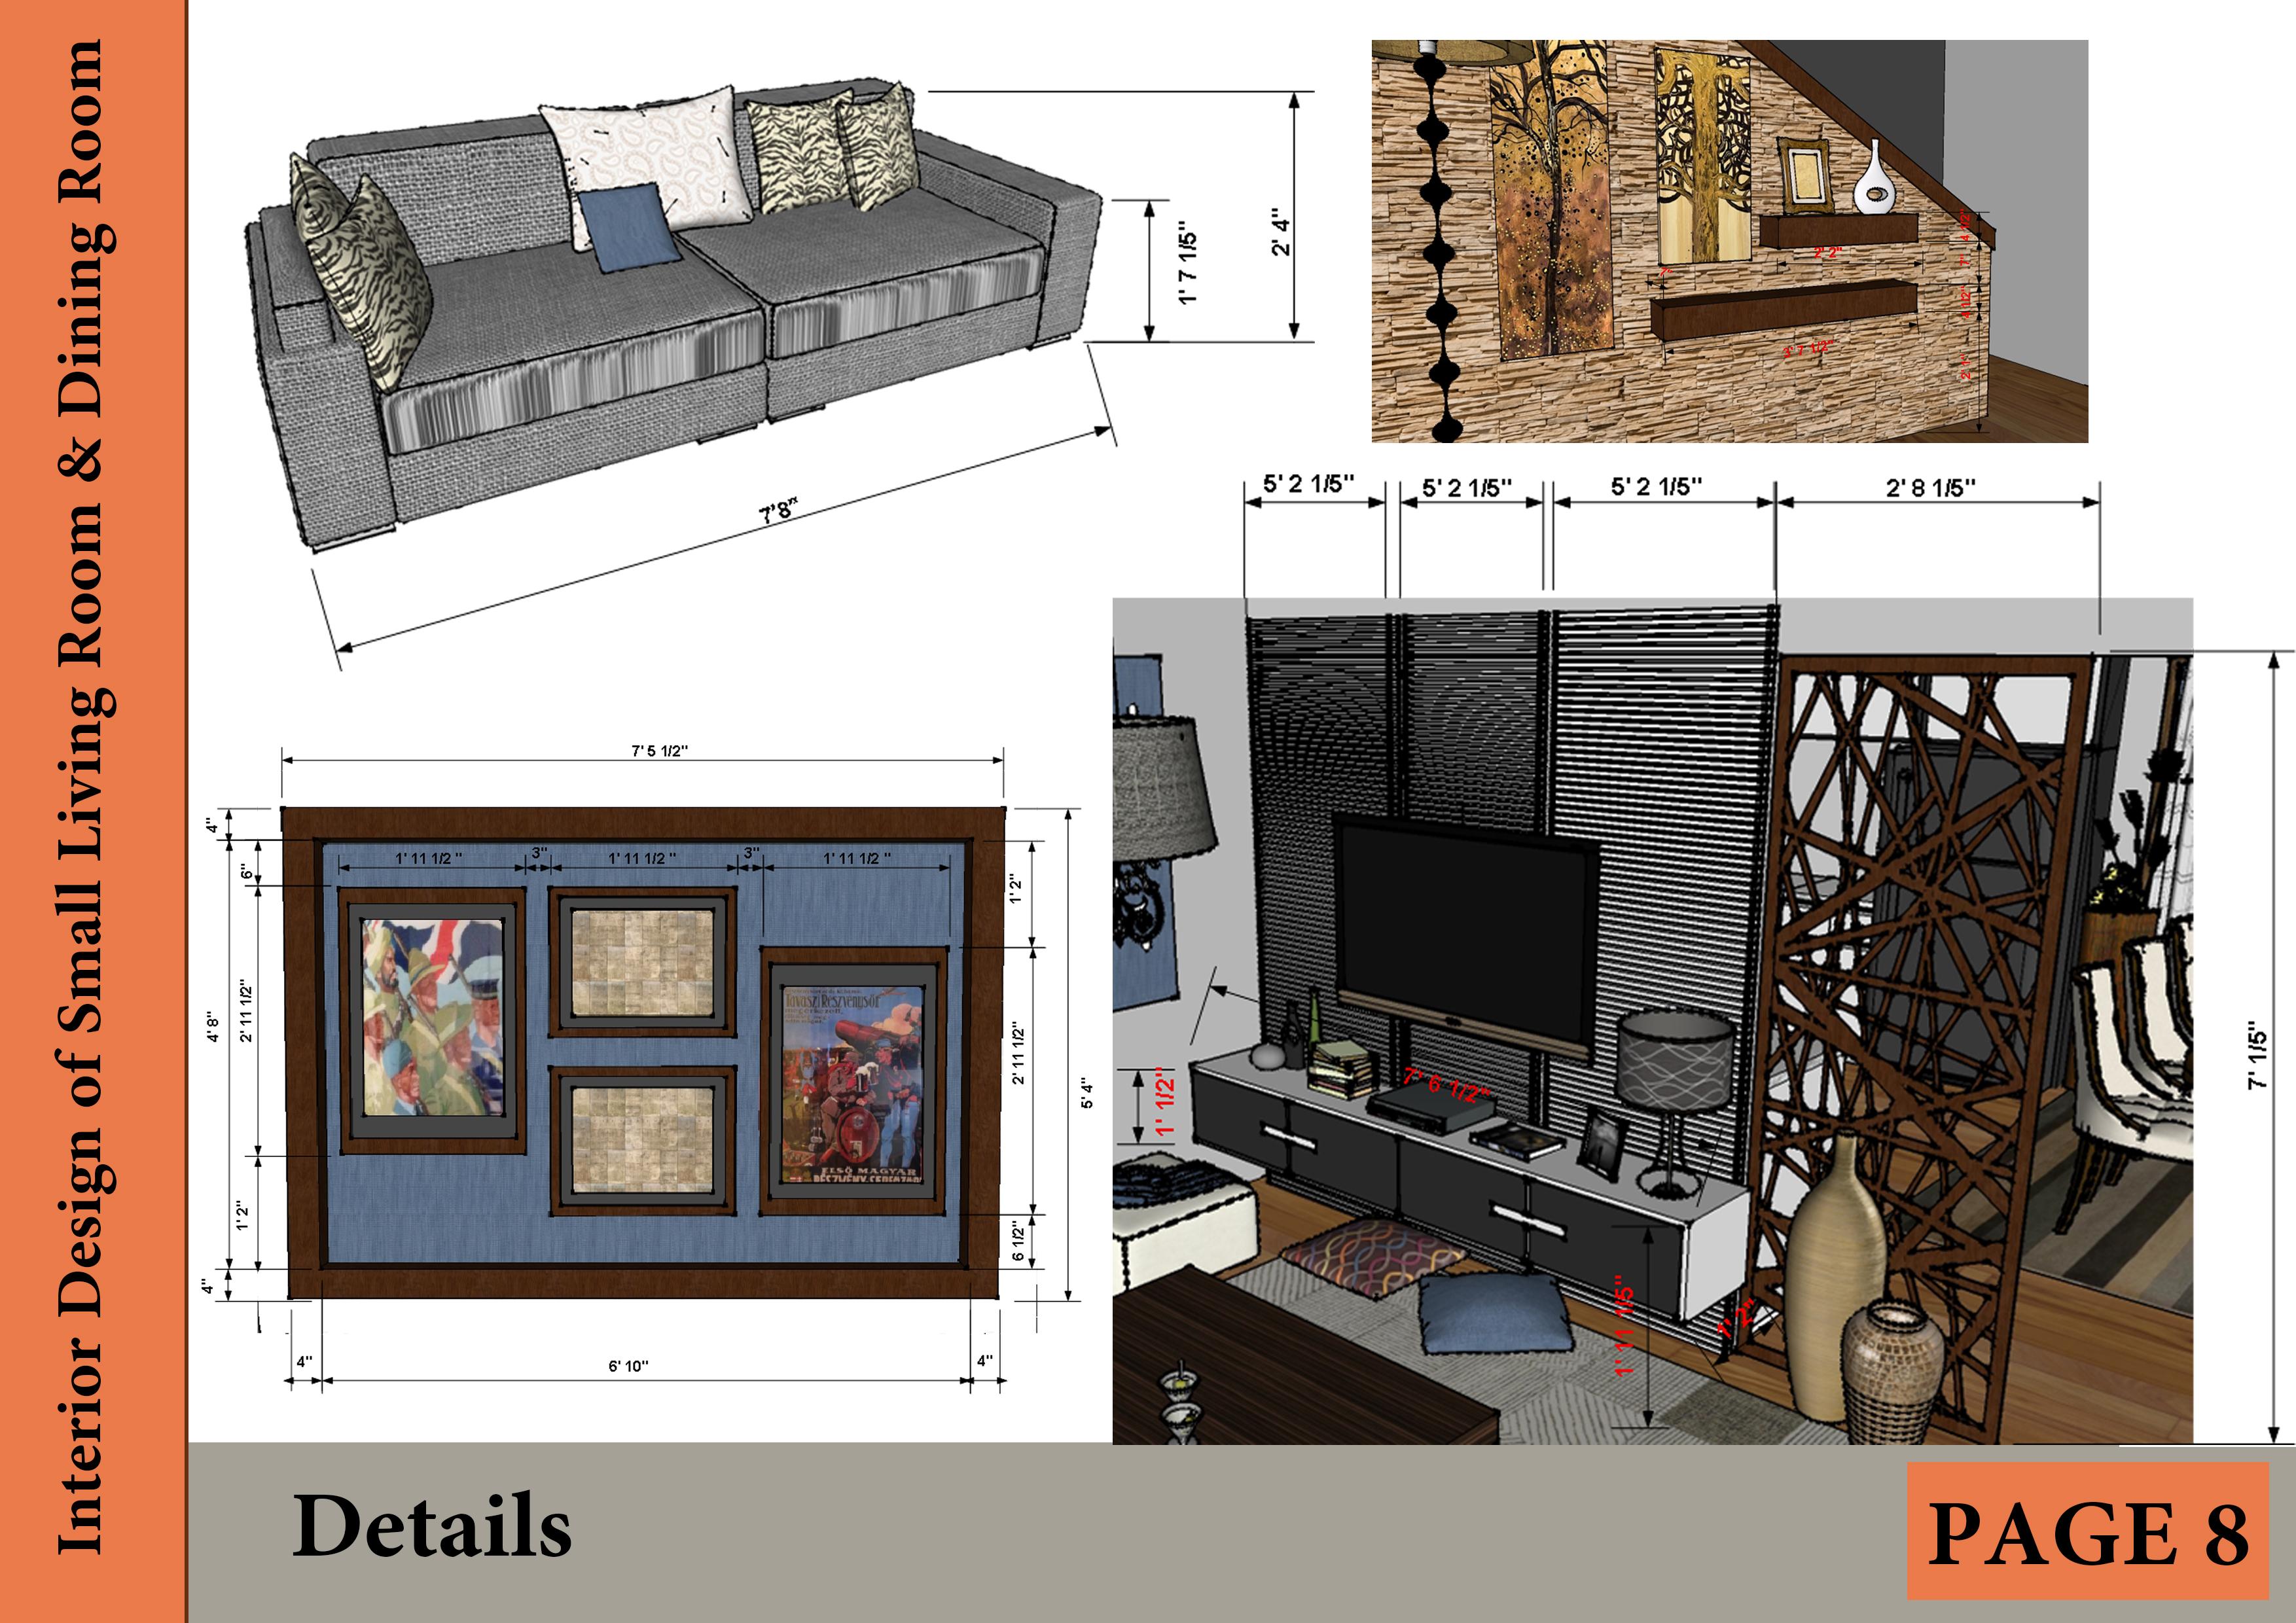 Interior Living Room Design Project Designed By Mai Taha Interior Design Of Small Living Room